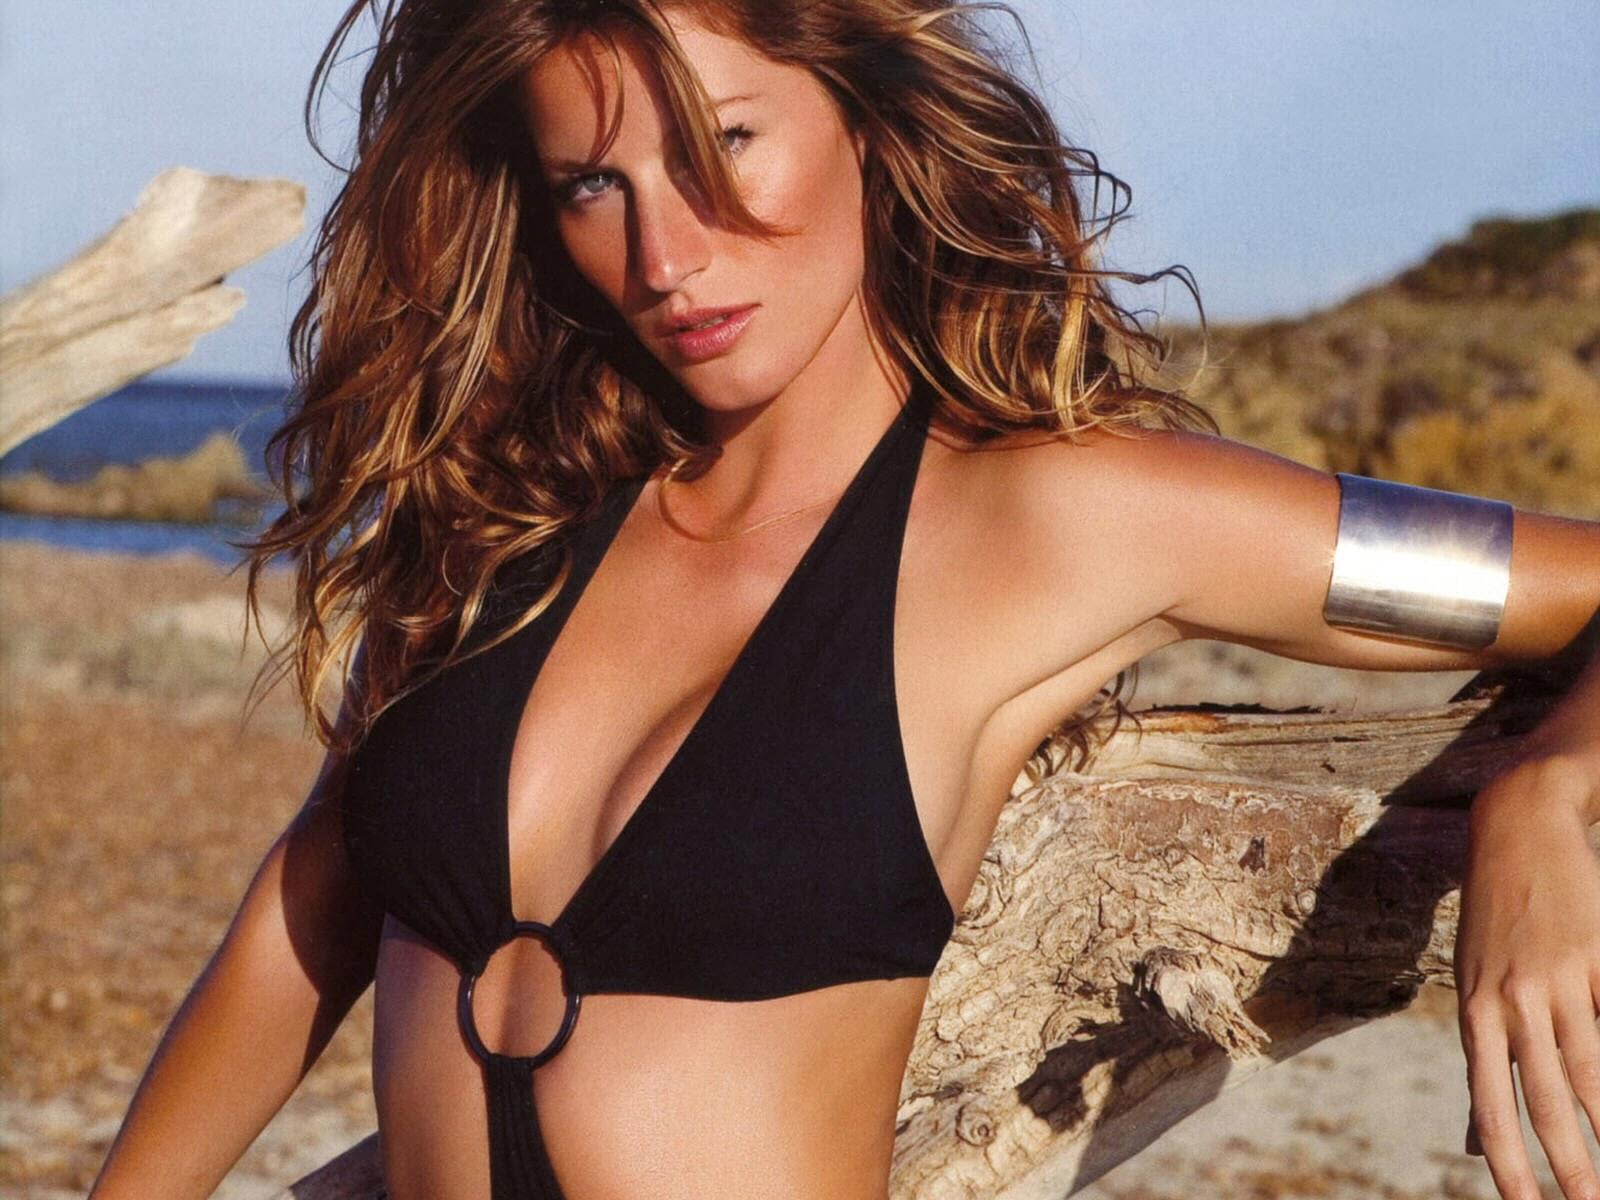 Brazilian Model Gisele Bundchen Hot Pics 171 Celebrities Hot